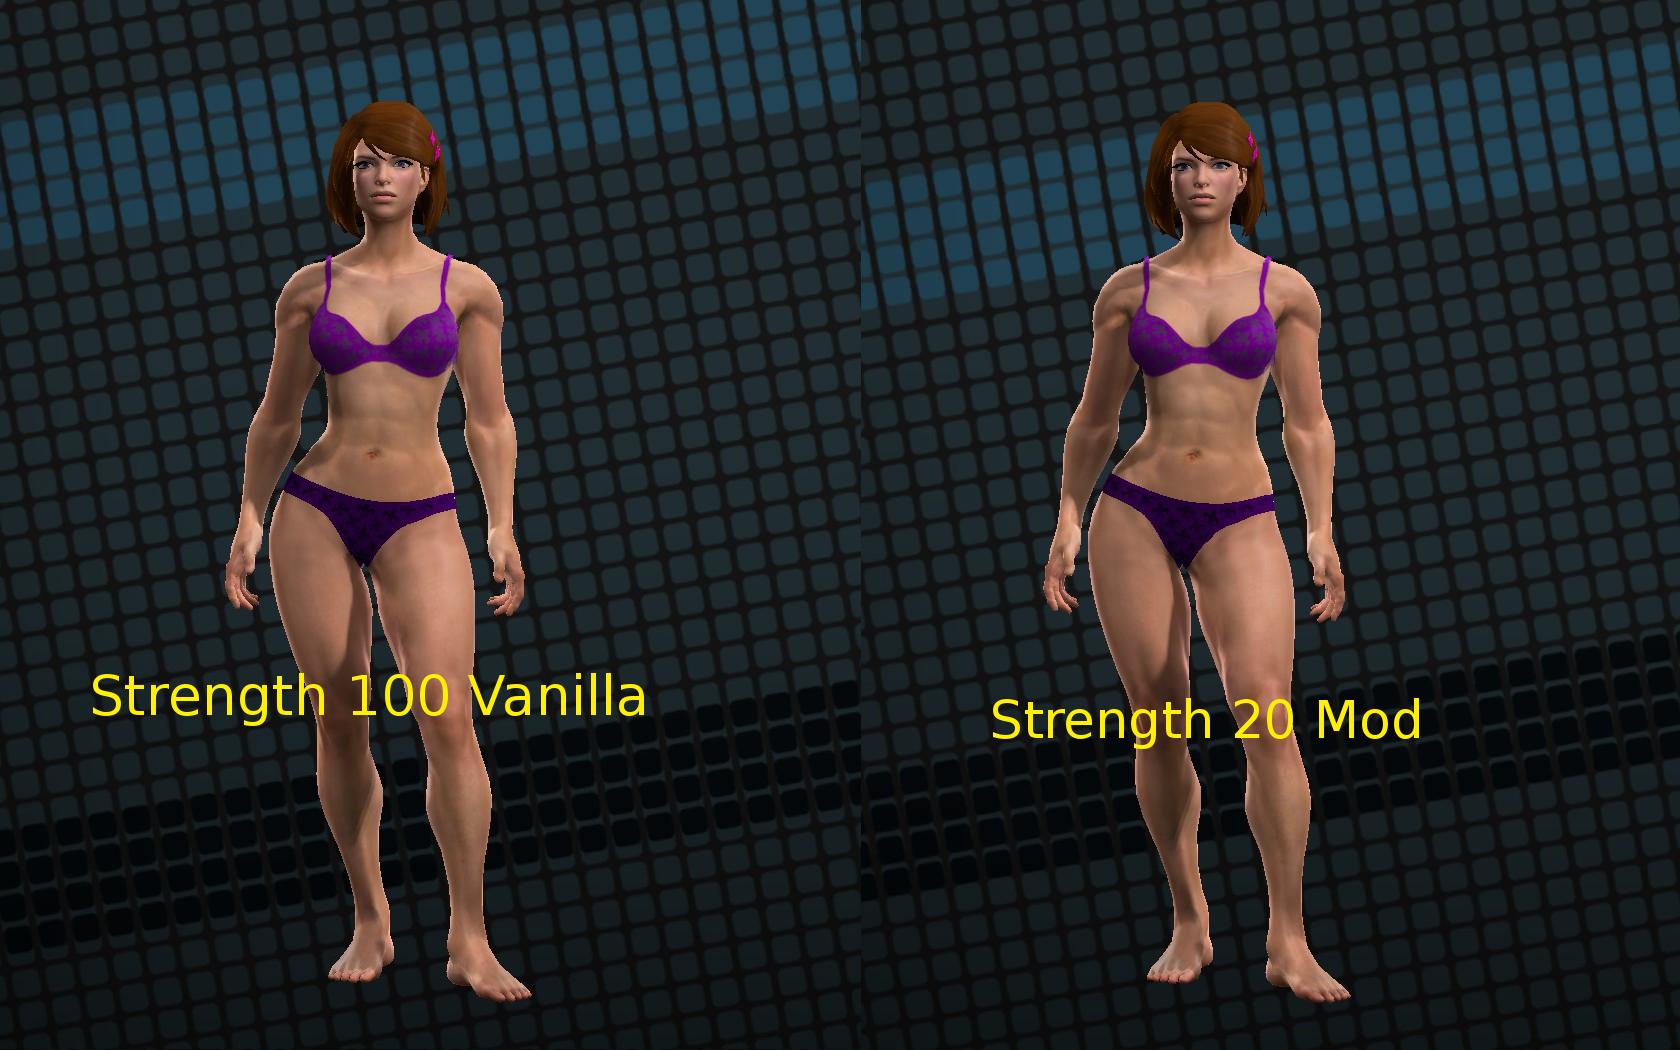 strength 100 vanilla vs strength 20 modded.png